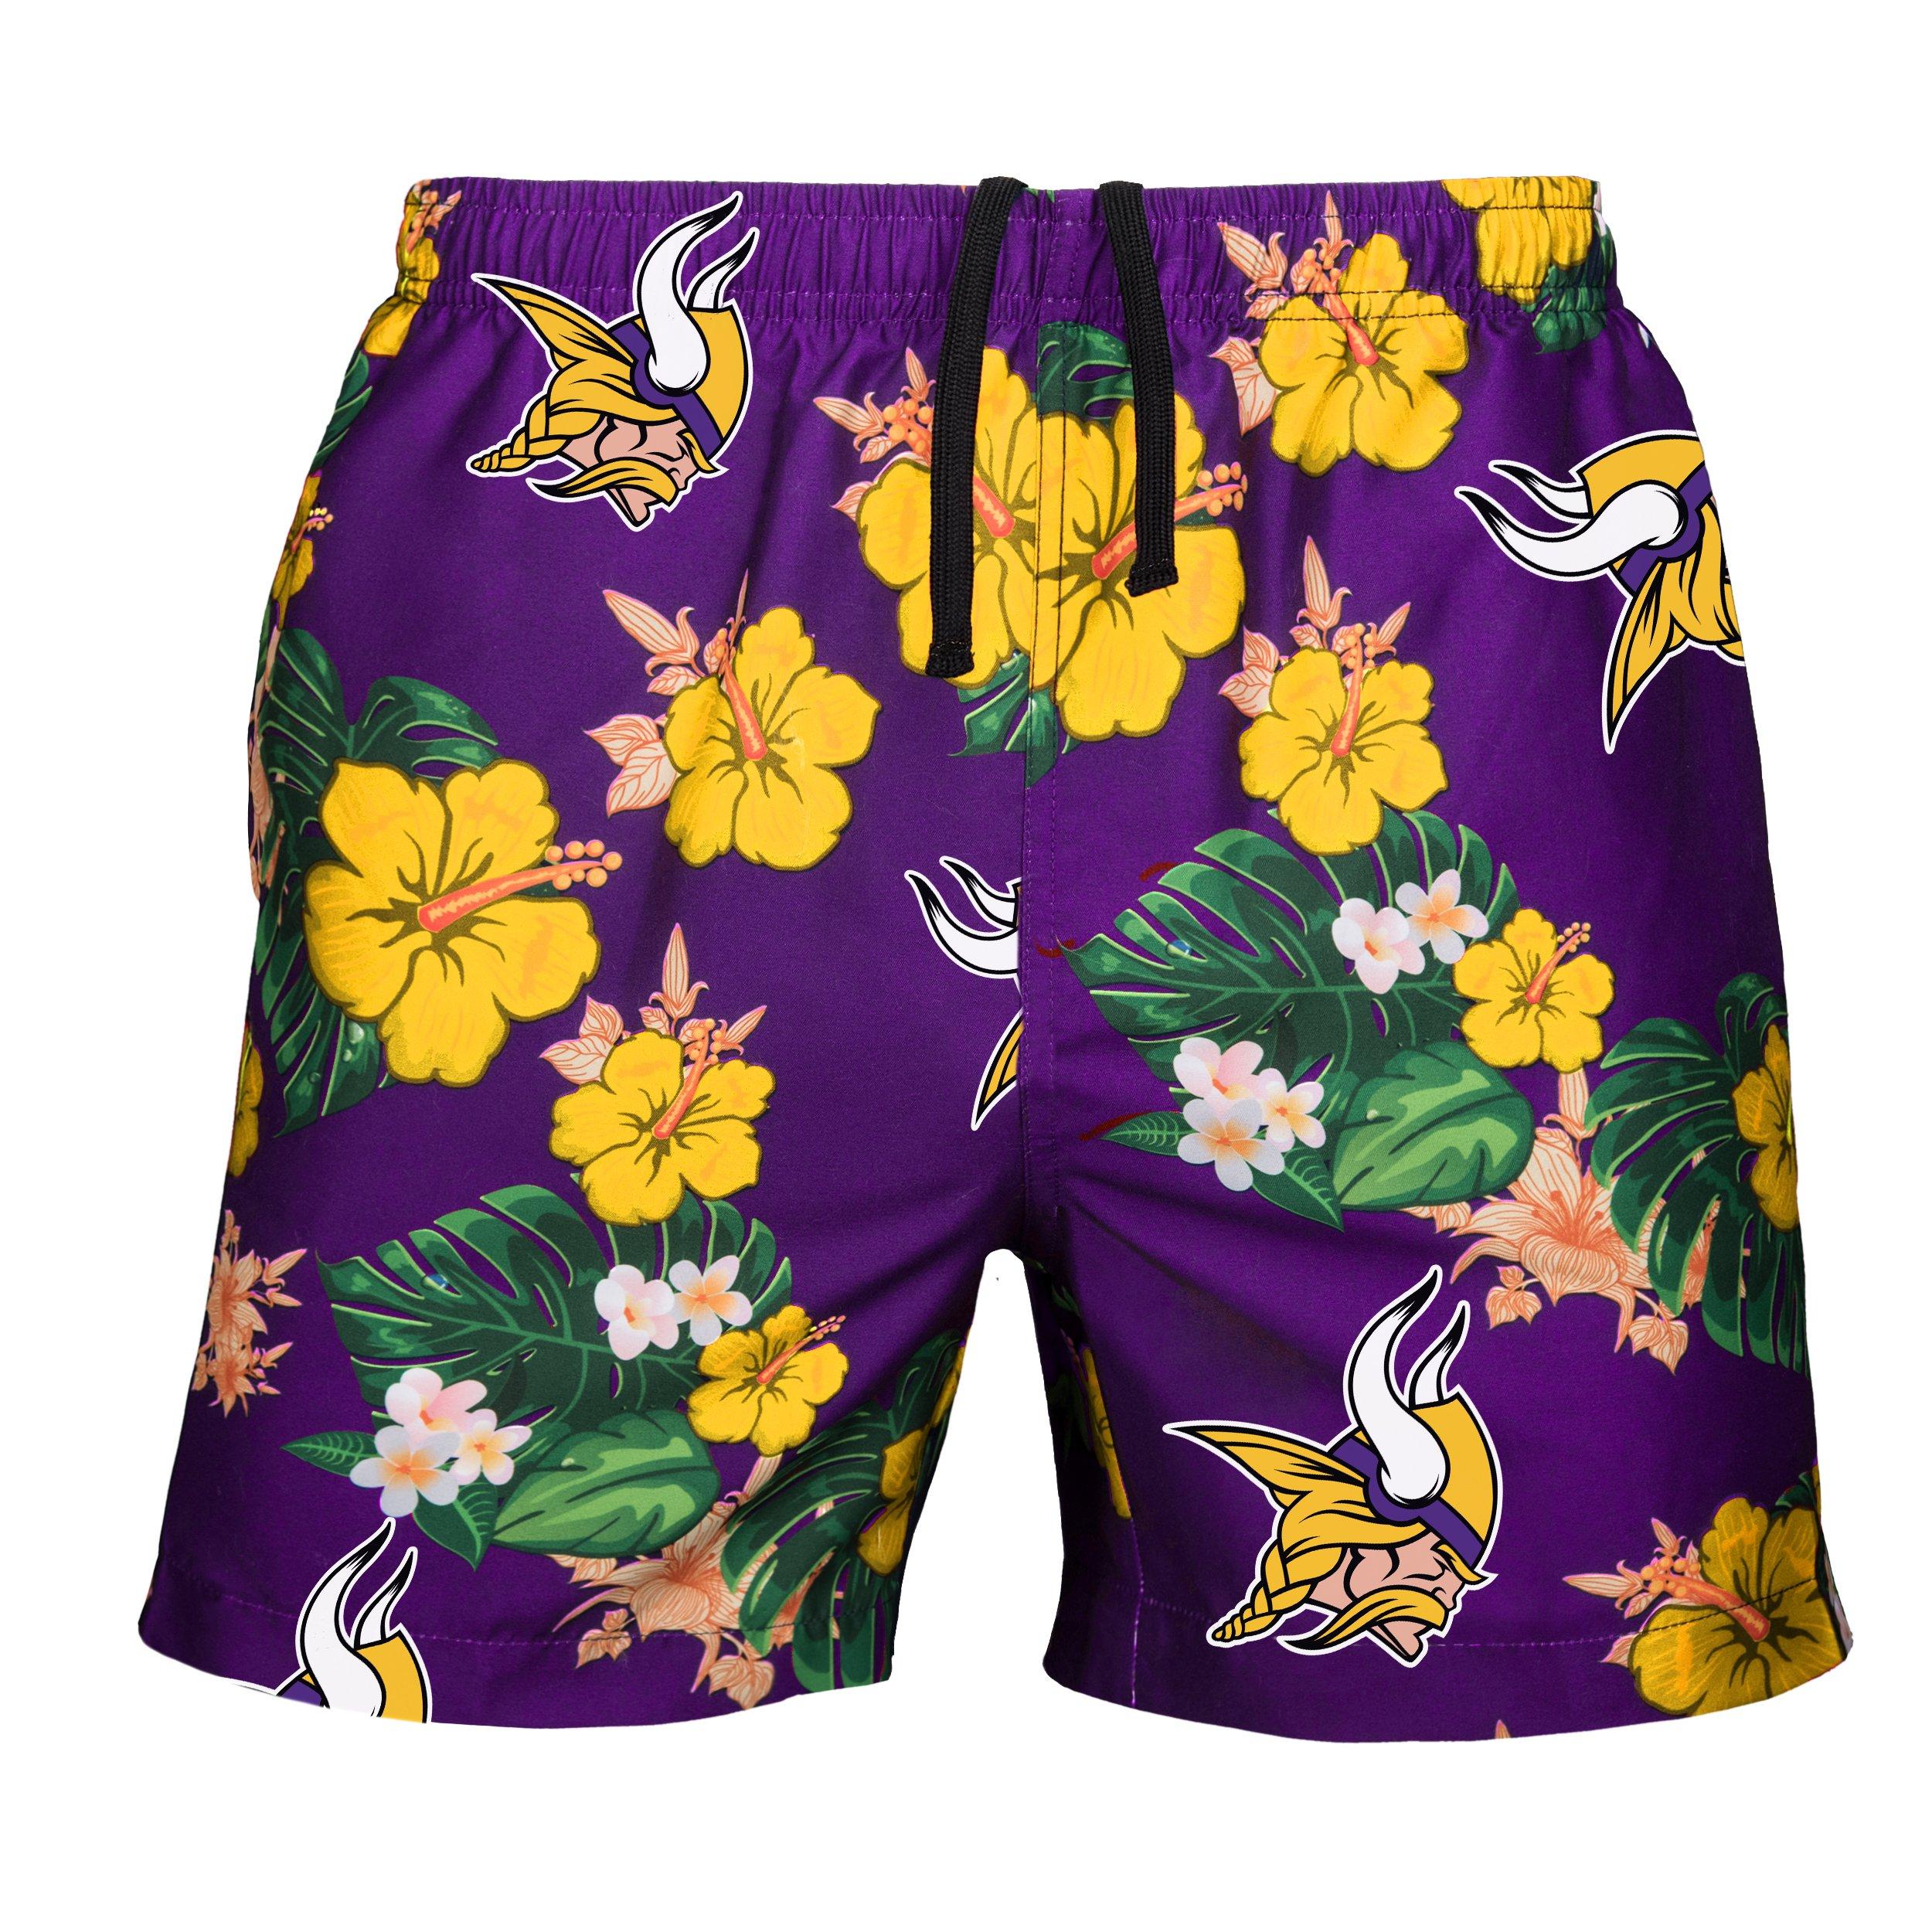 FOCO Men's Team Logo Floral Hawaiin Swim Suit Trunks, Color, Medium (30''-32'')